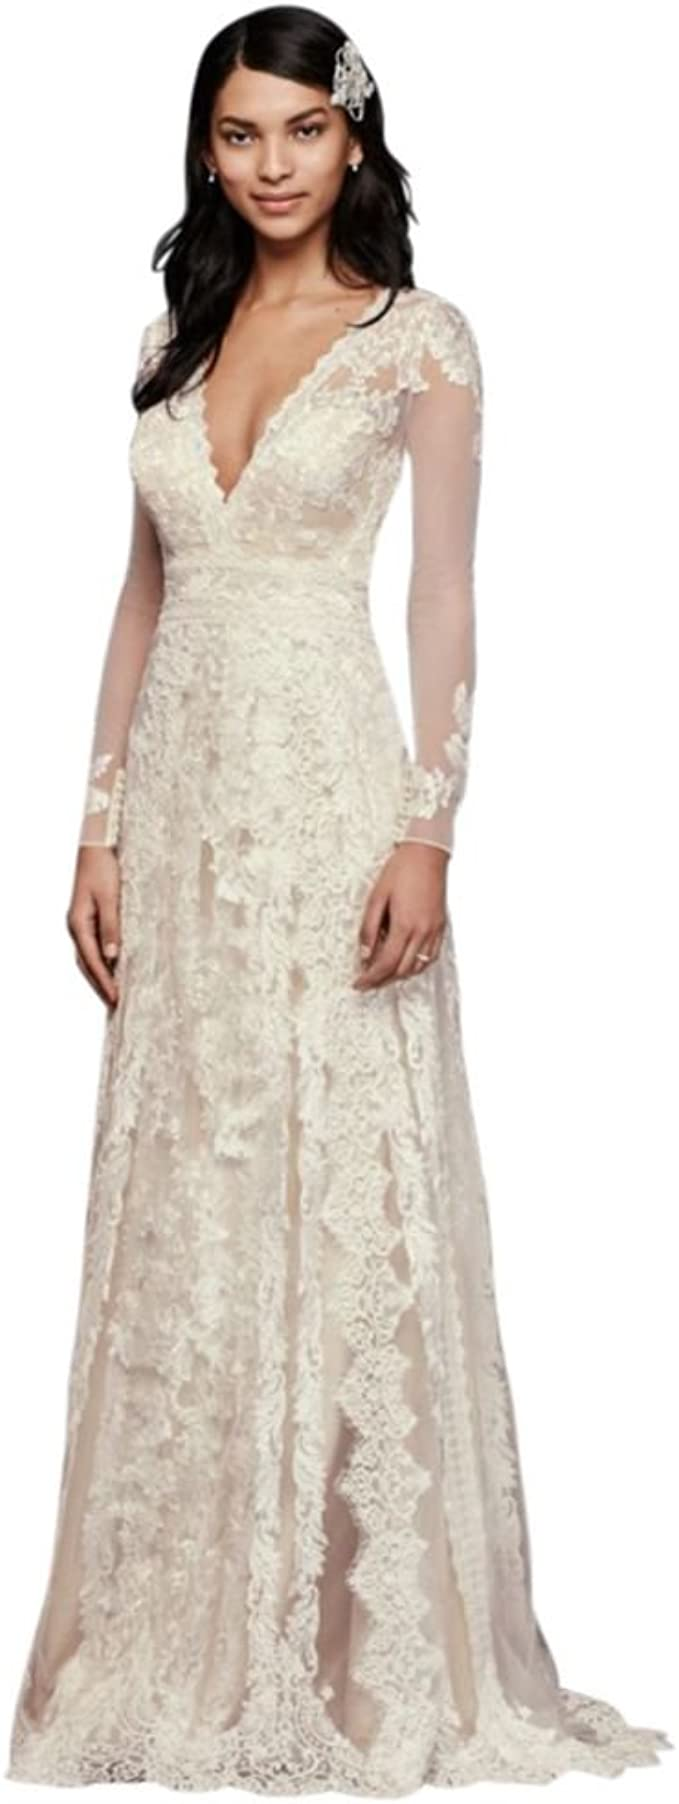 David's Bridal Tulle Melissa Sweet Linear Lace Wedding Dress Style ...